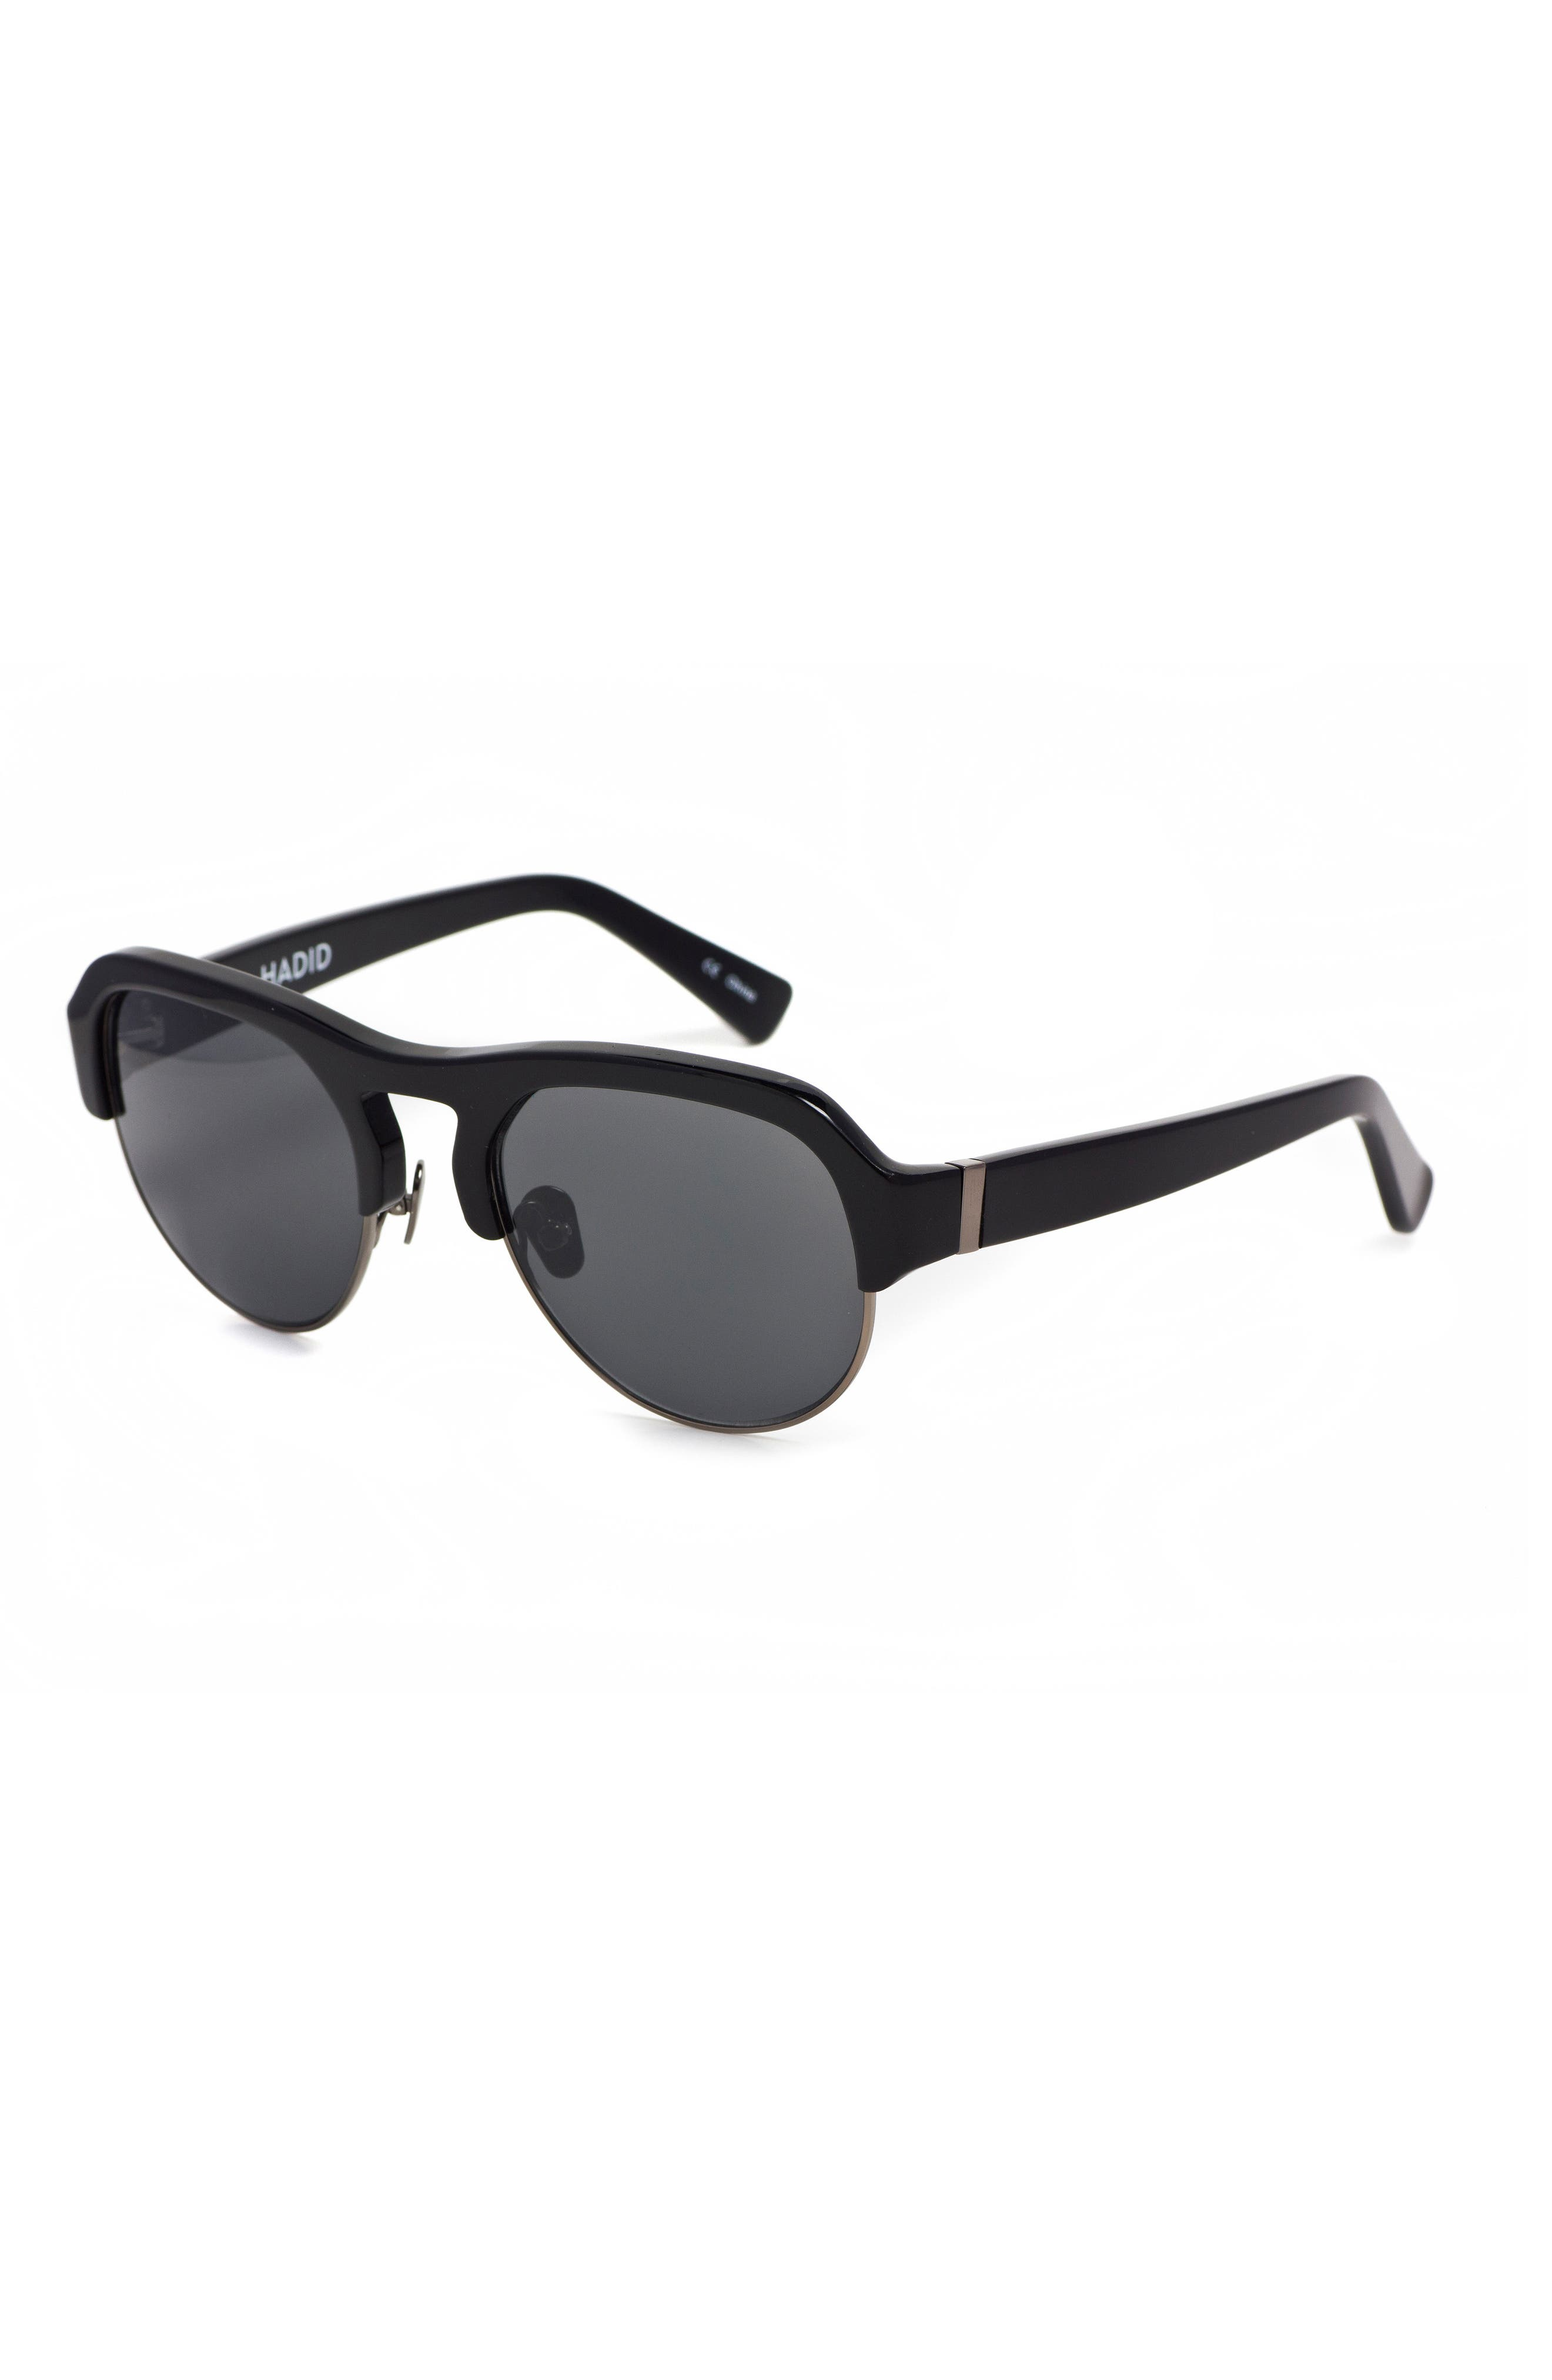 Nomad 52mm Sunglasses,                             Alternate thumbnail 4, color,                             Black/ Gunmetal